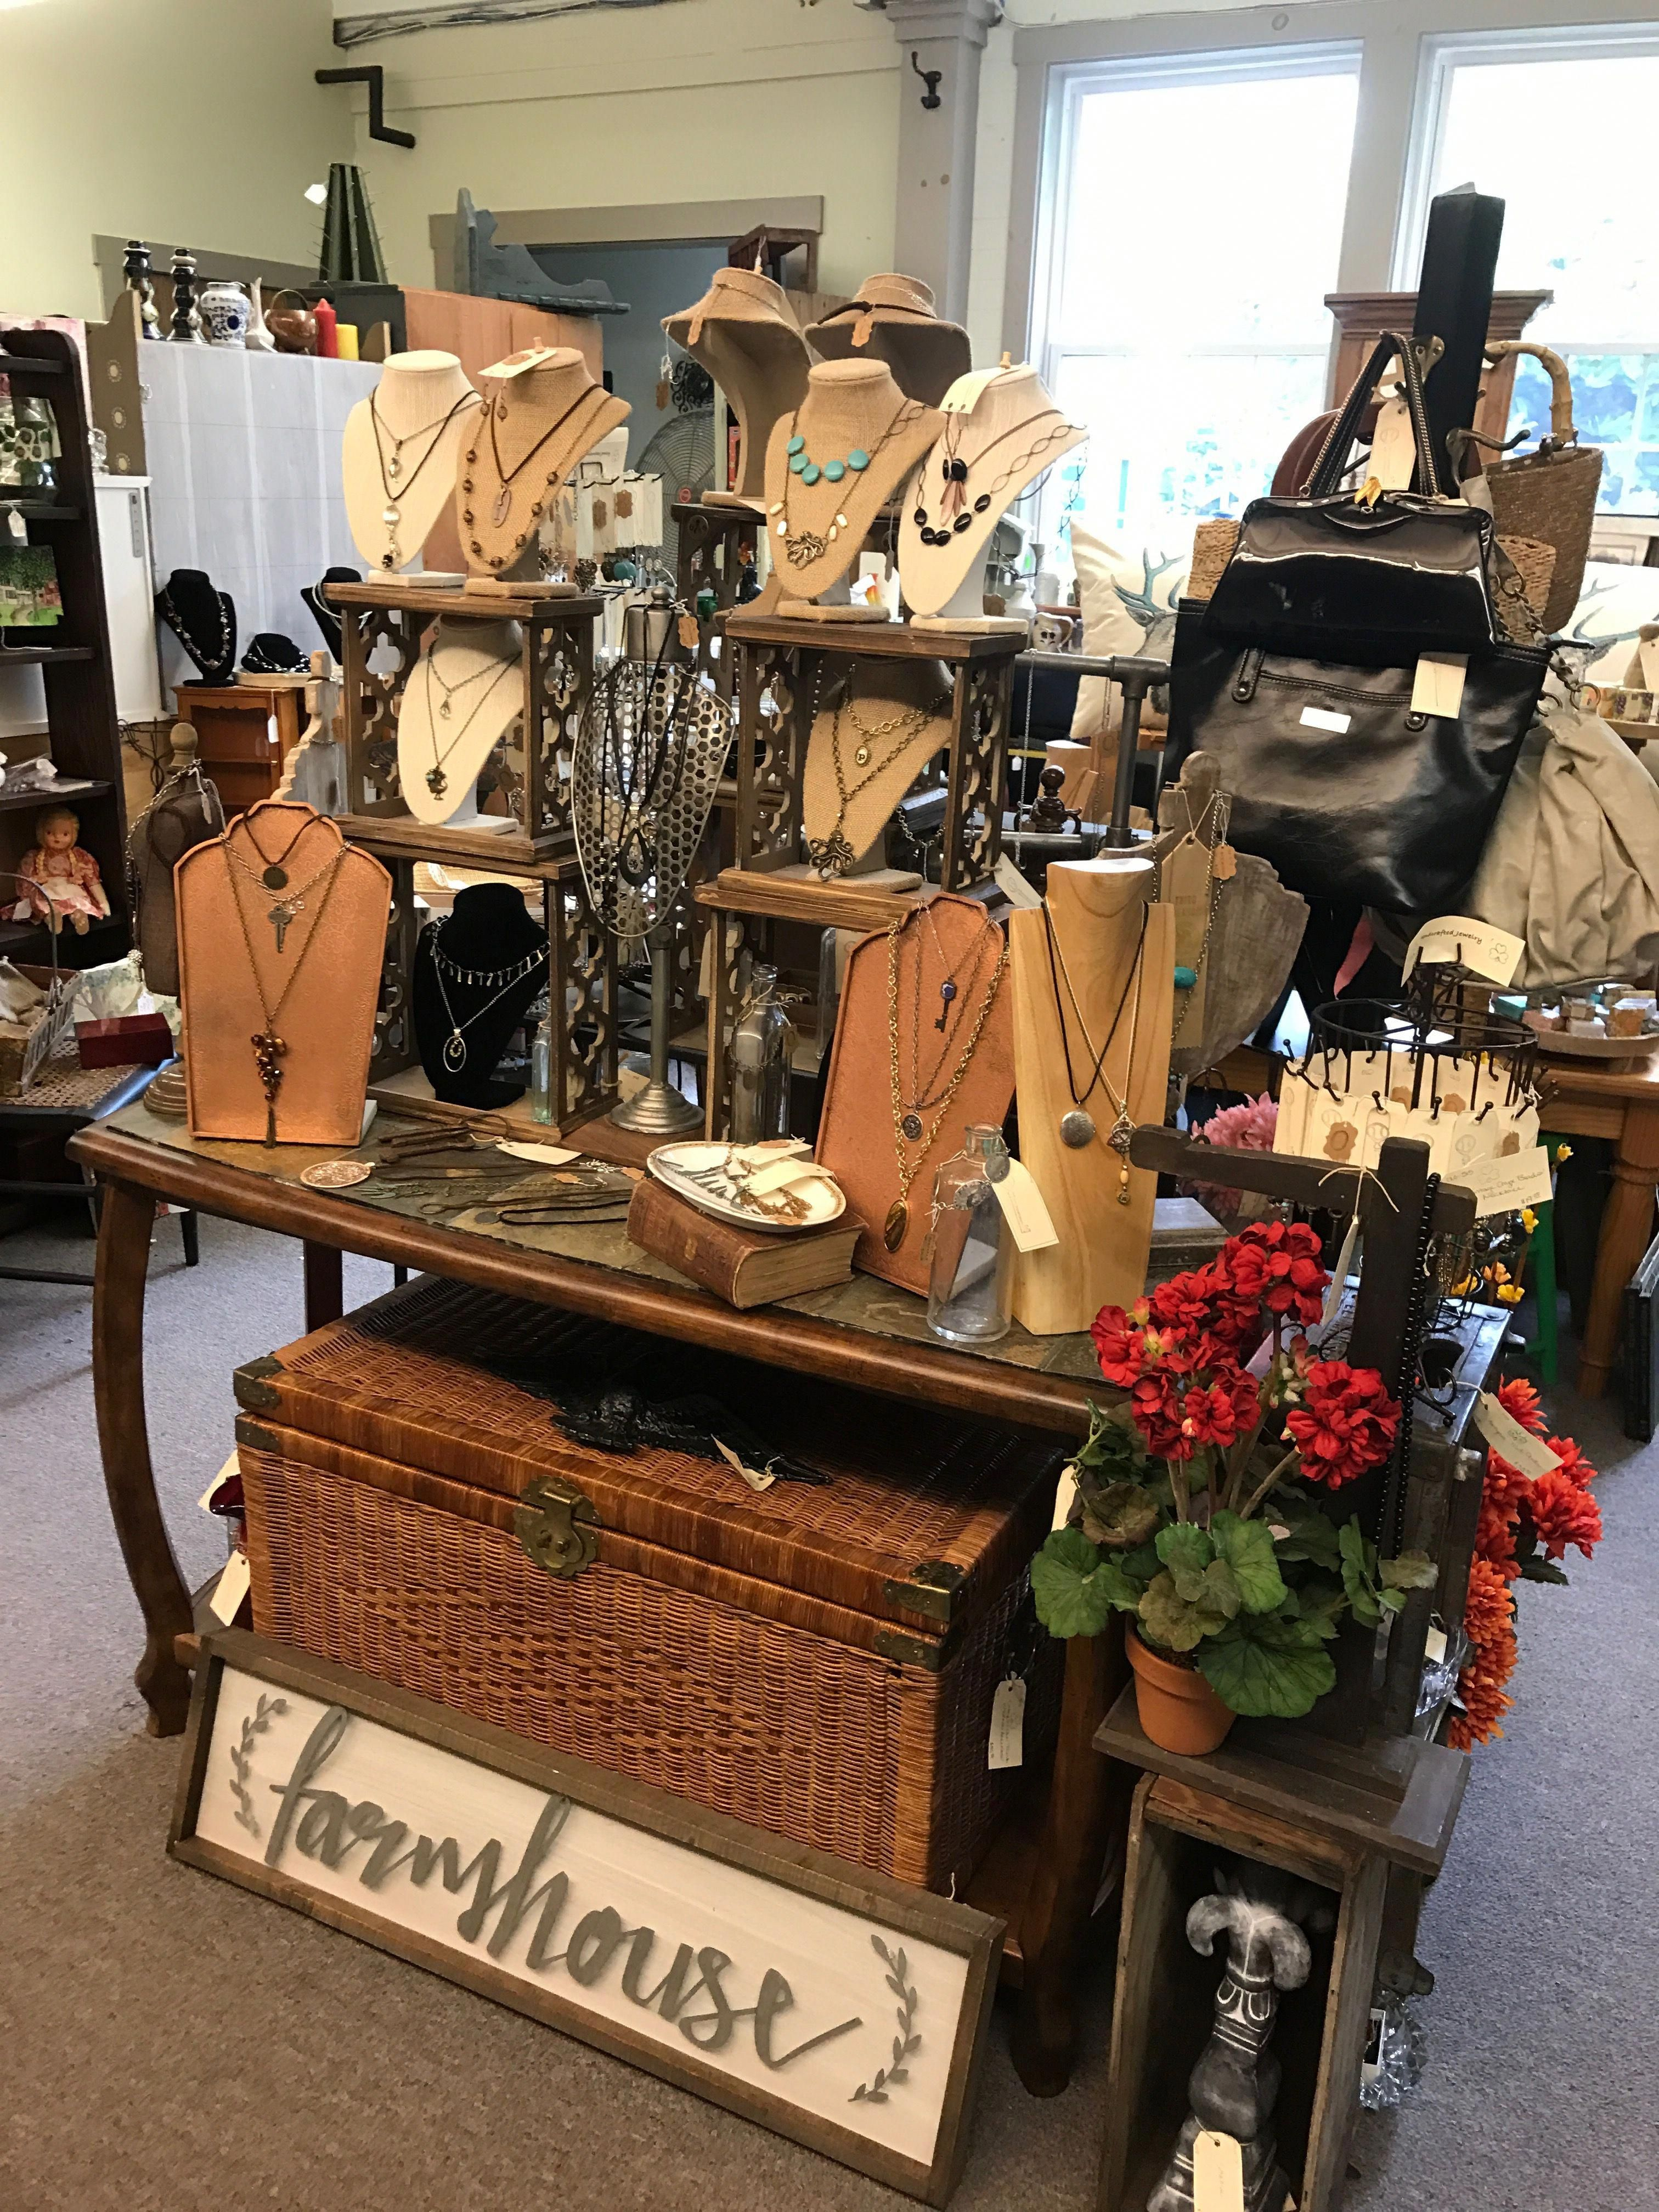 handcrafted jewelry shamrock vintage  bernat antiques